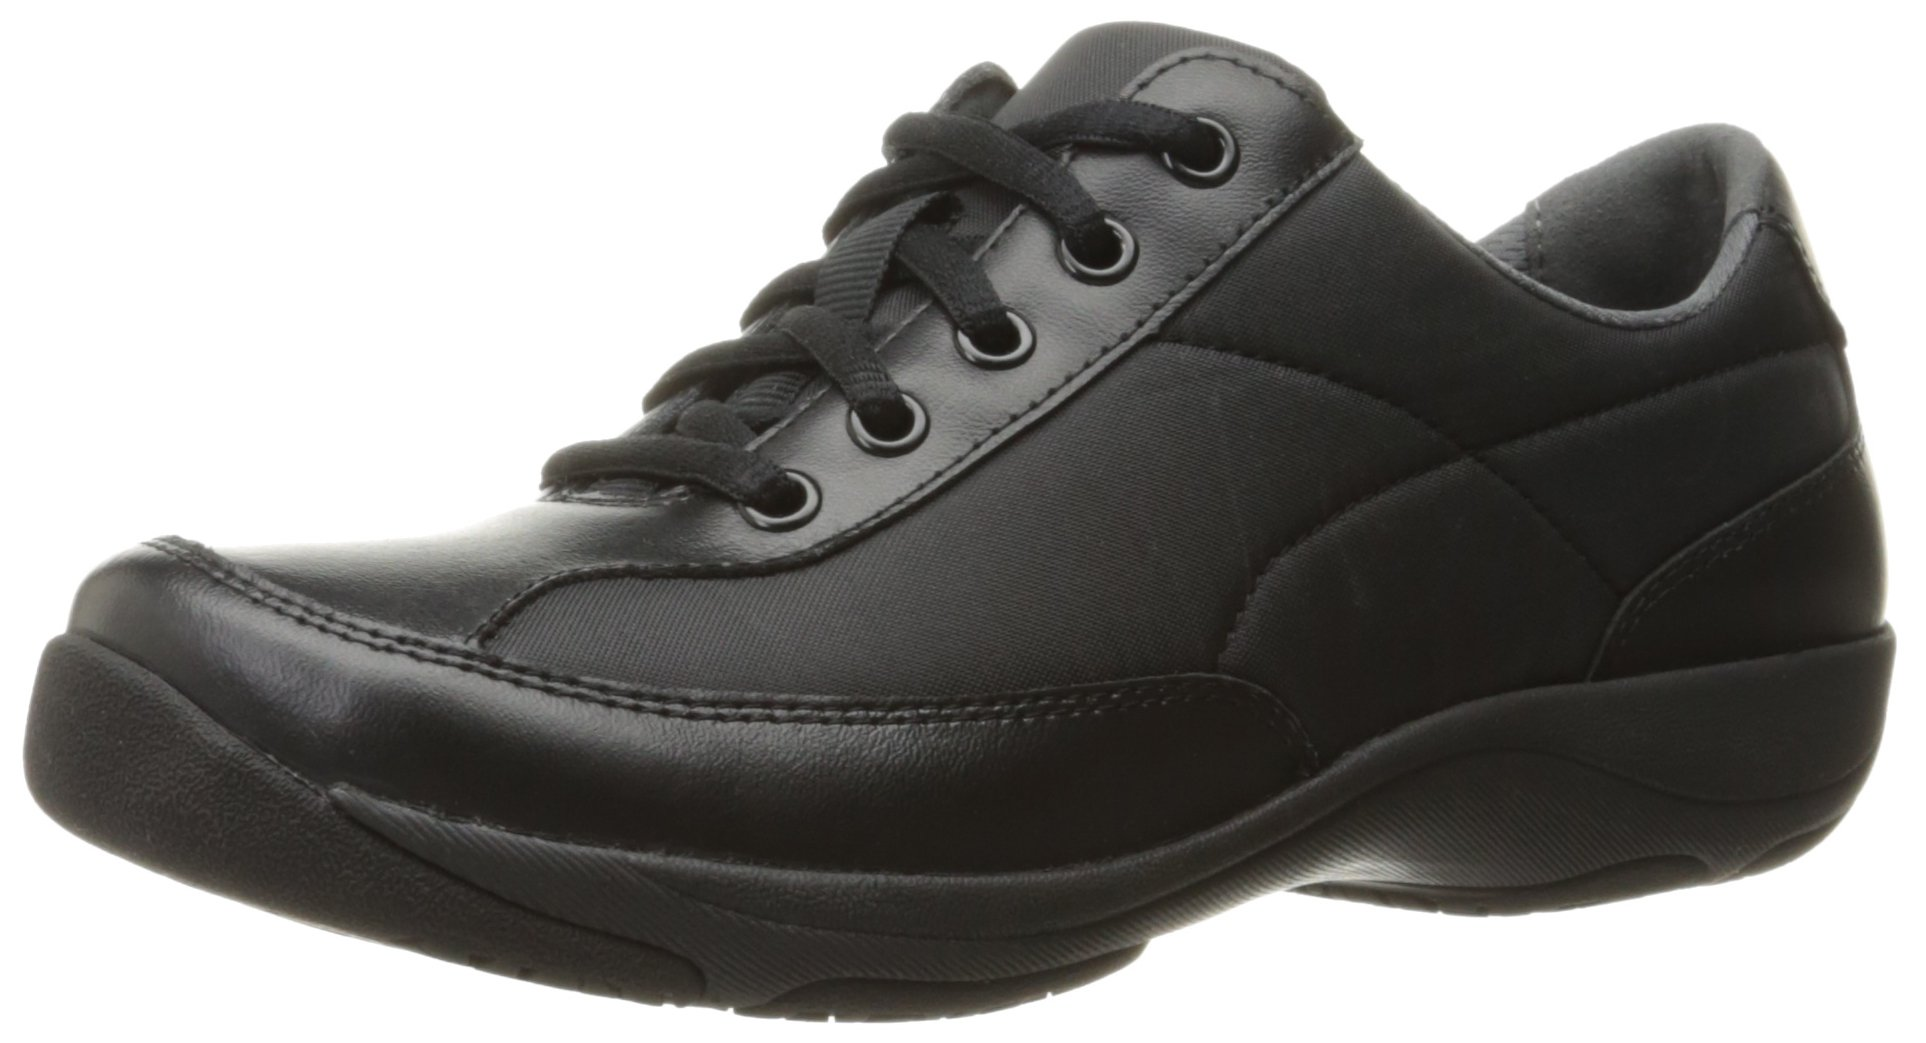 Dansko Women's Emma Flat, Black Nylon/Leather, 36 EU/5.5-6 M US